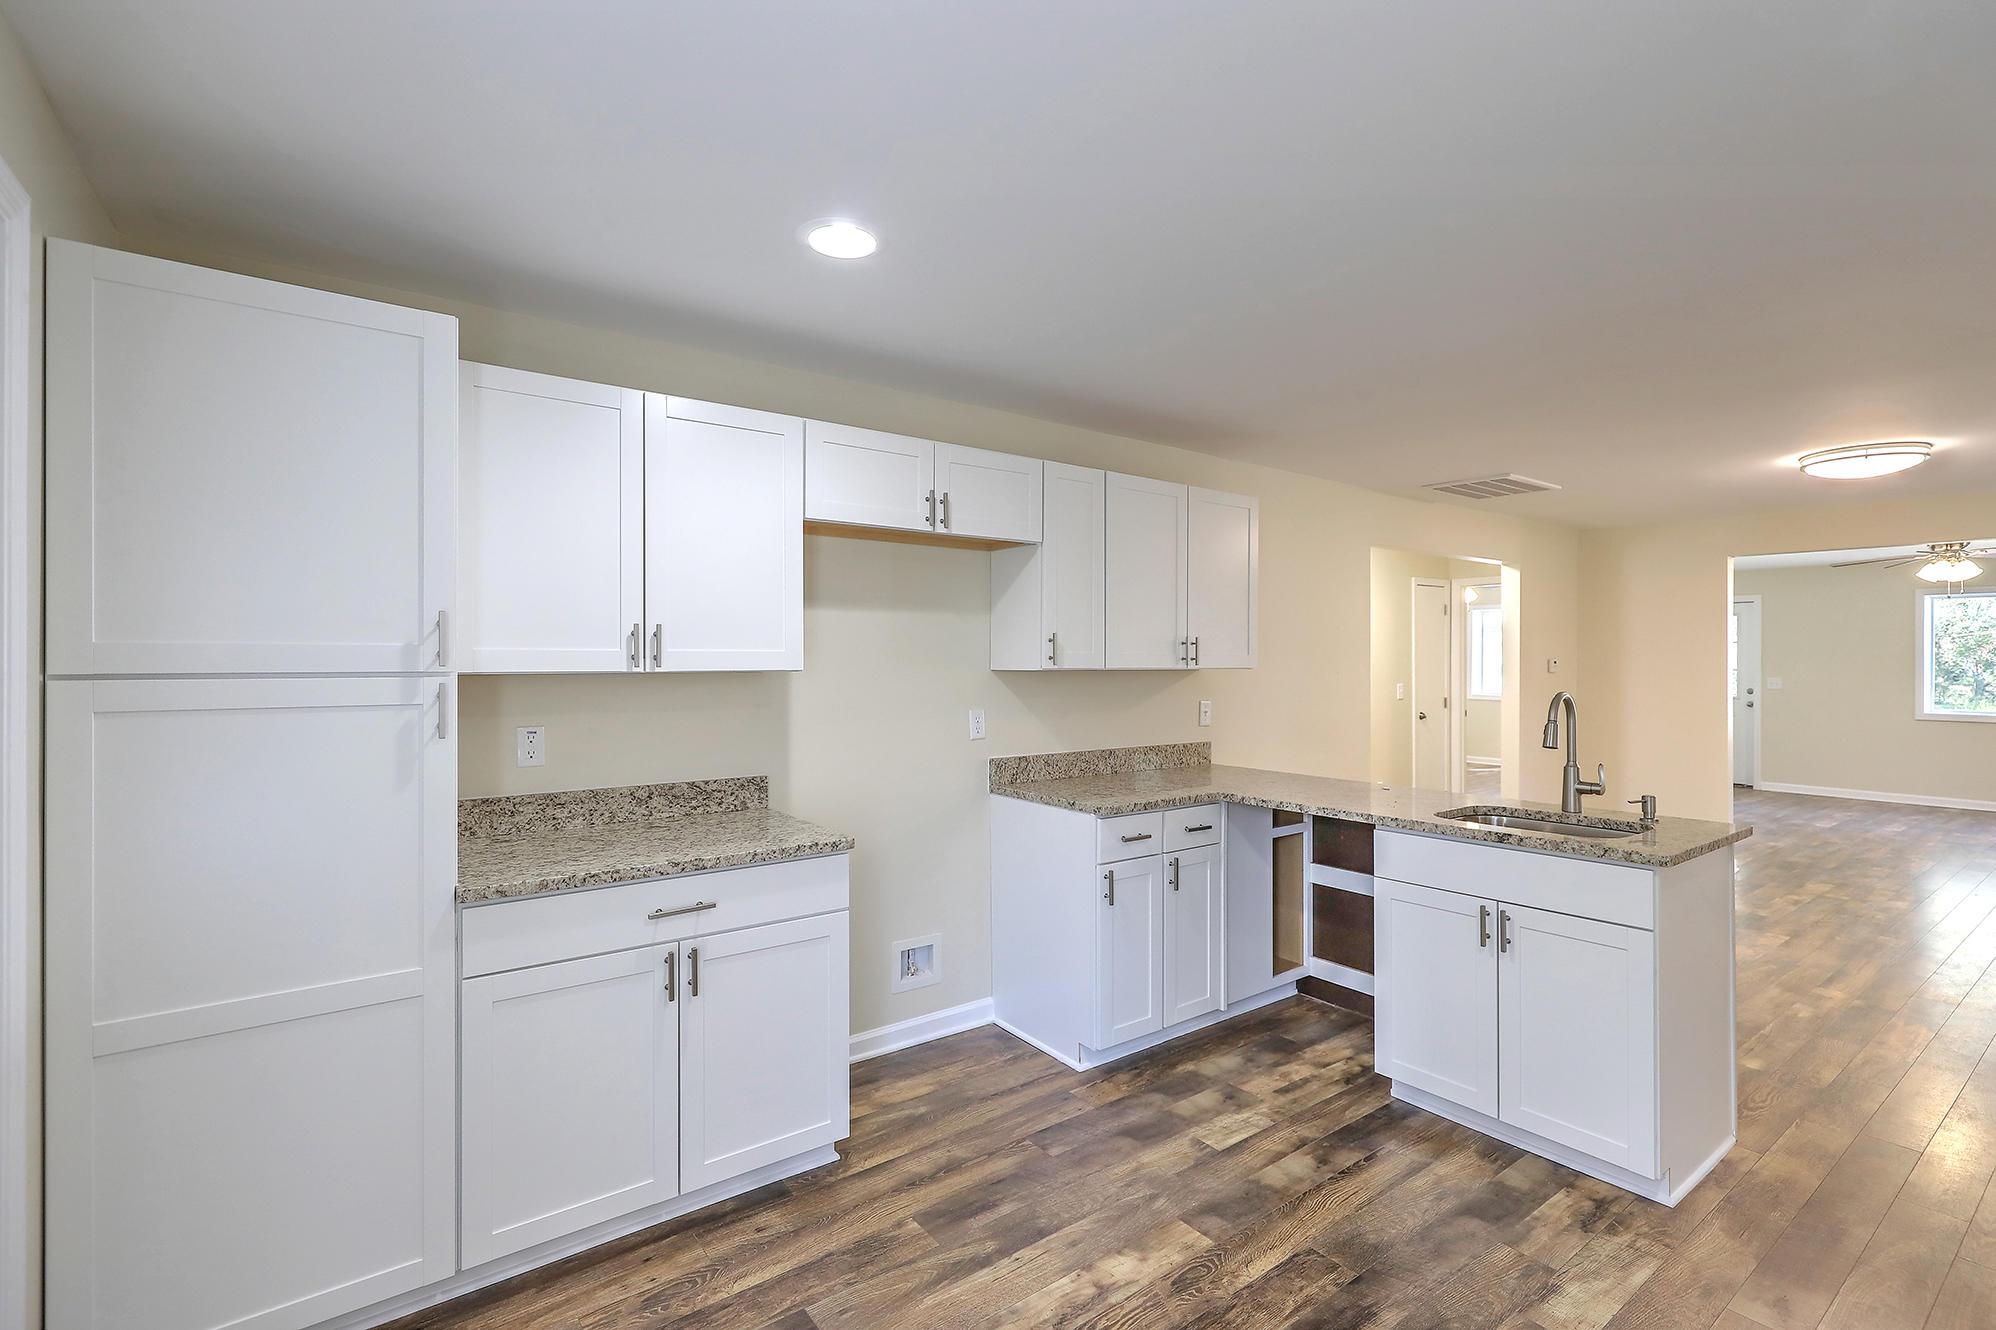 Liberty Hill Homes For Sale - 4876 Upjohn, North Charleston, SC - 13